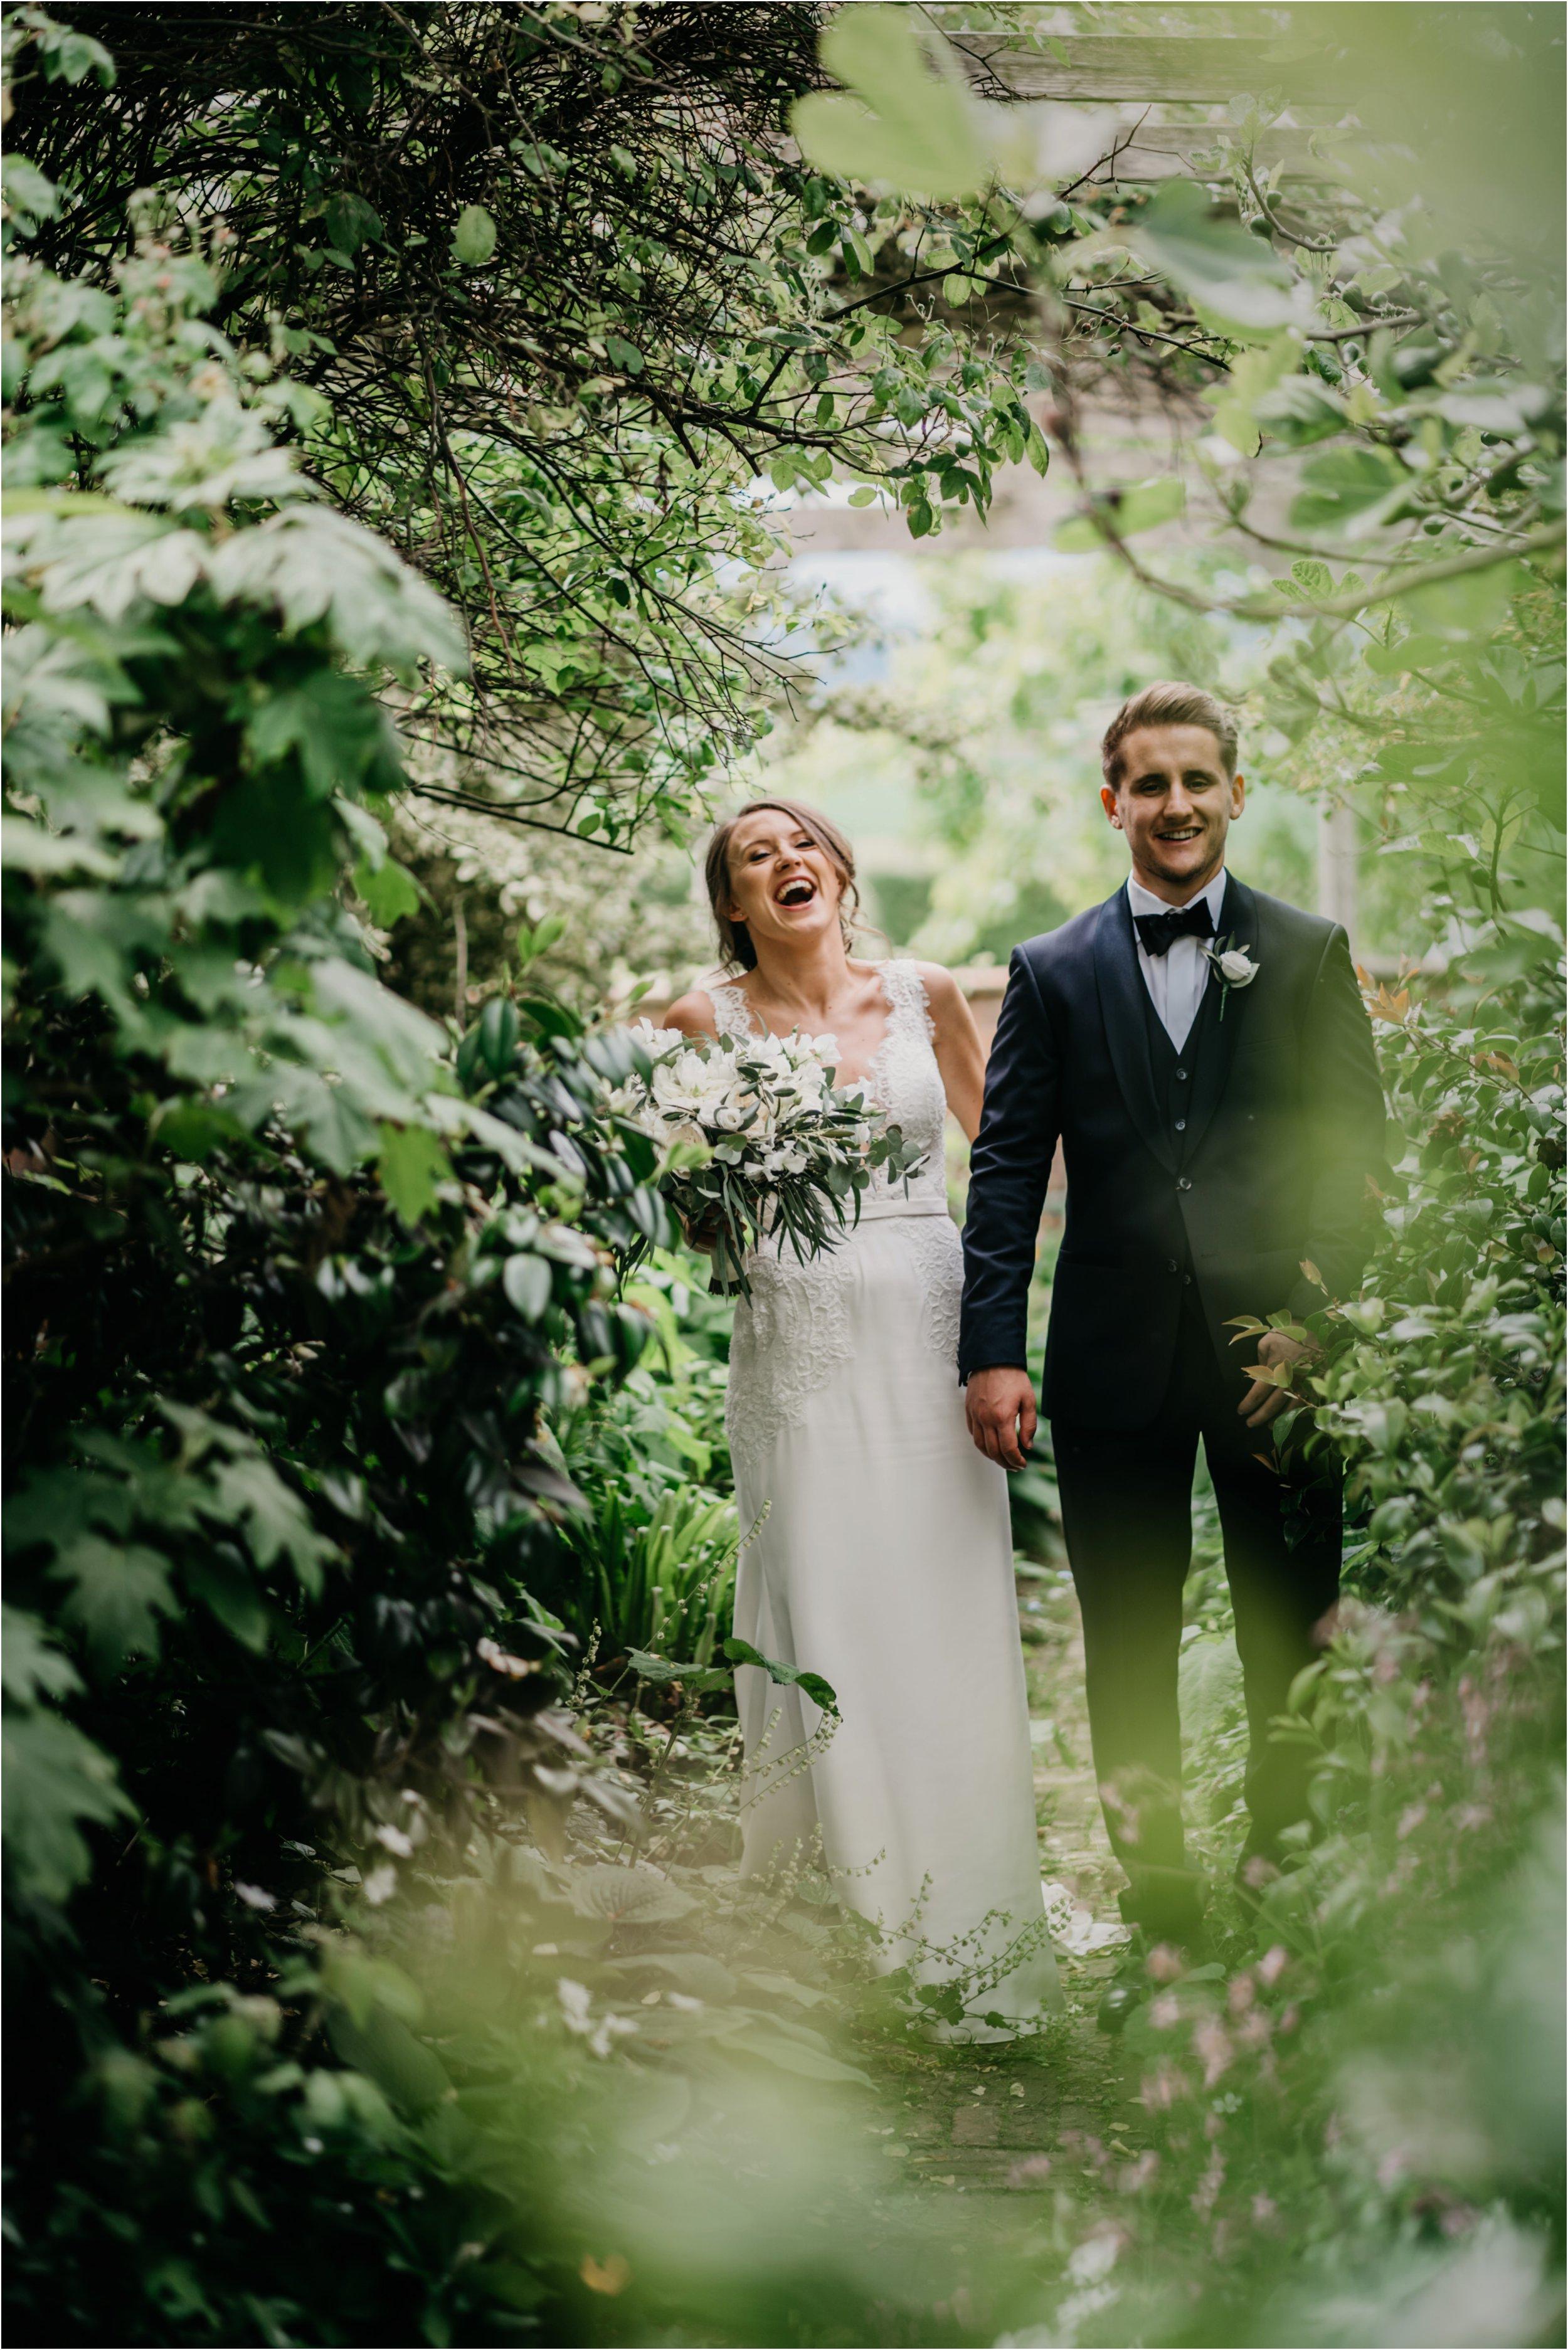 Dewsall Court Herefordshire wedding photographer_0072.jpg